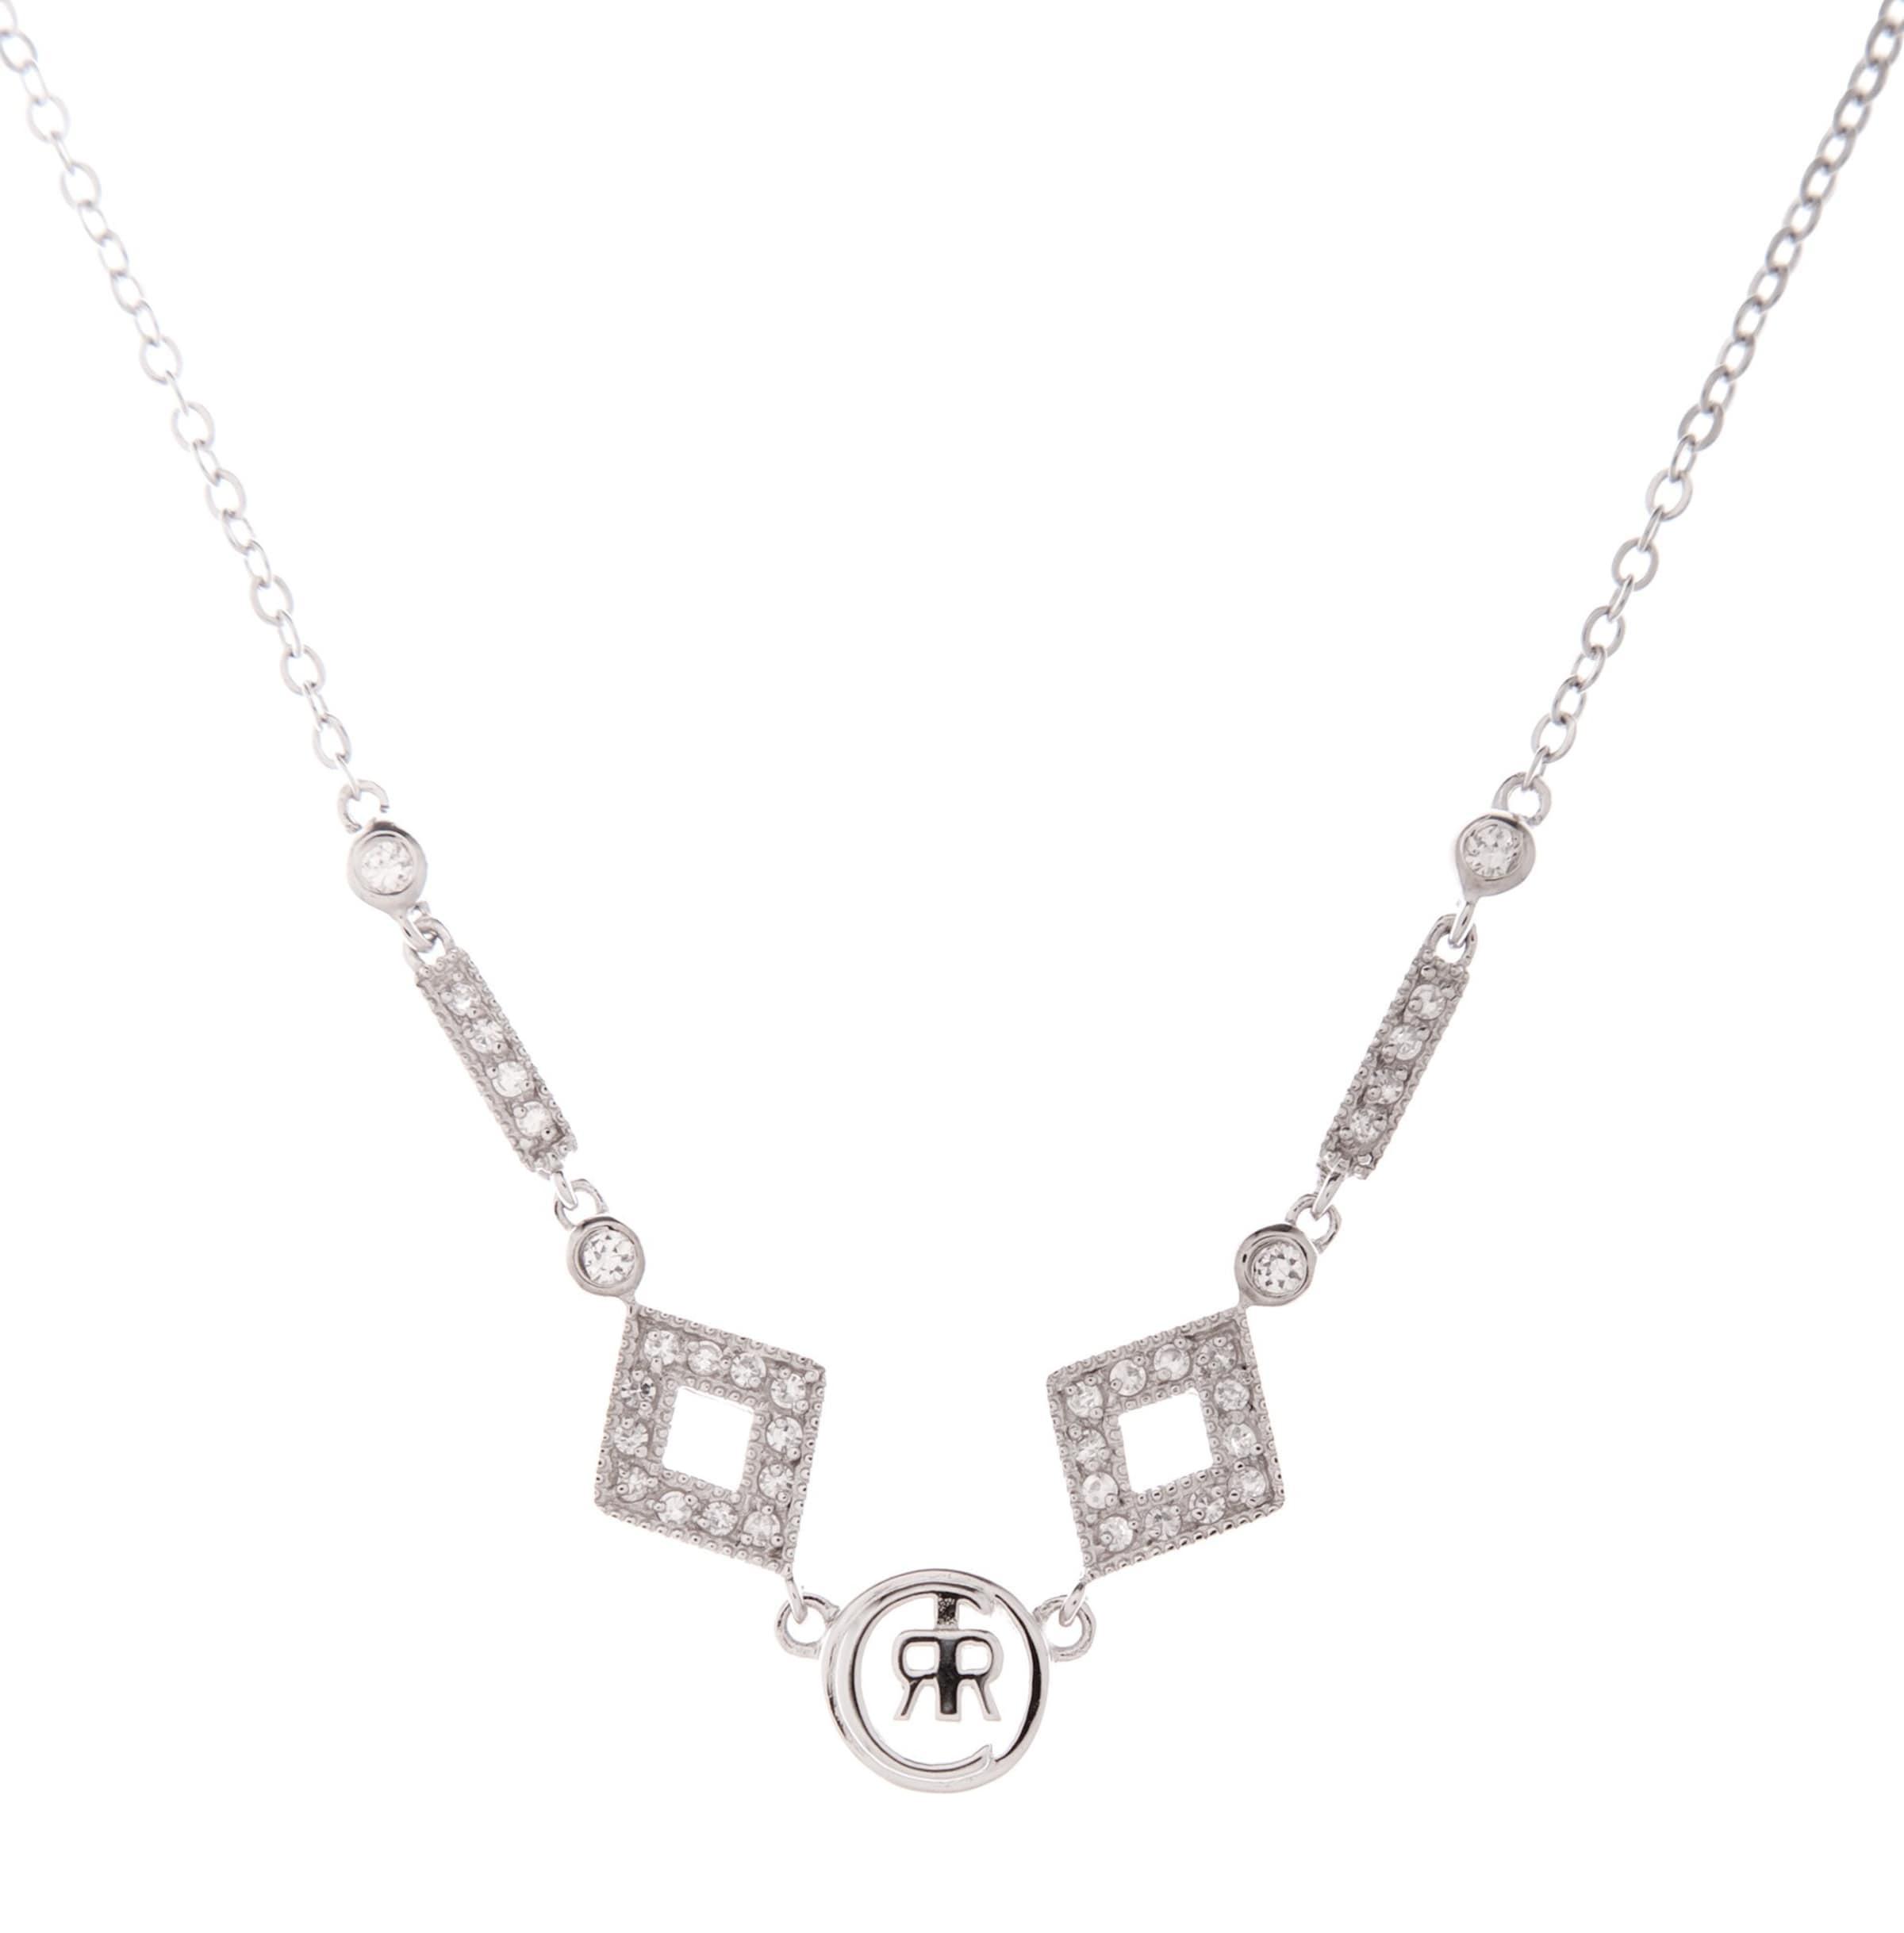 Halskette Silber Cerruti In 'r42154z' Halskette Cerruti qUSzVpGLM